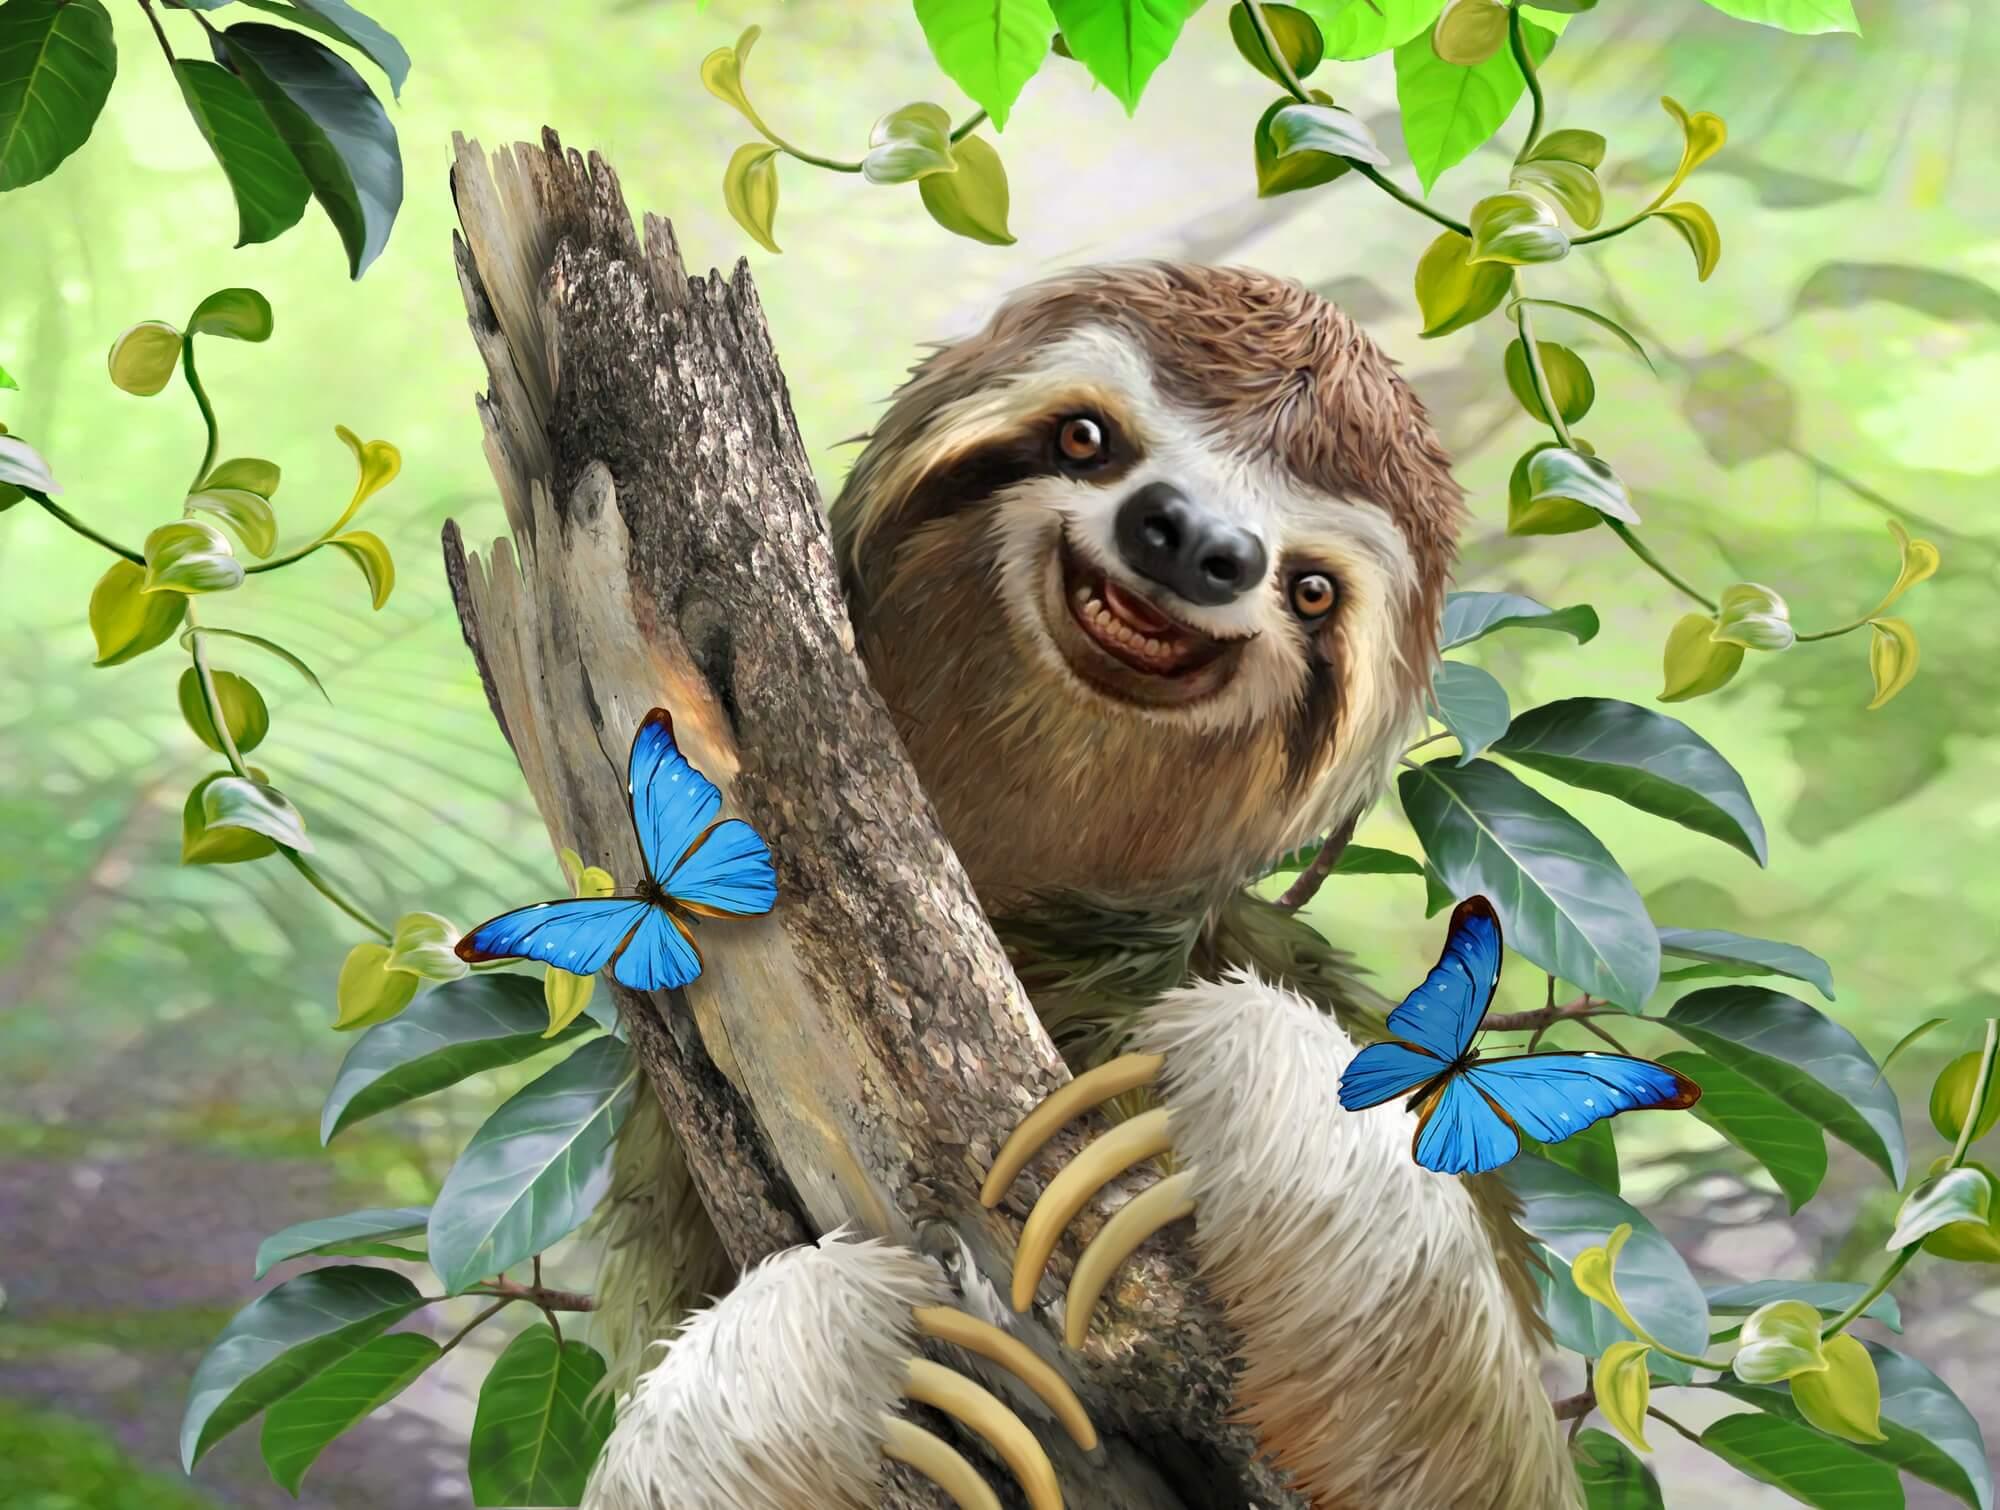 Howard robinson wall murals howard robinson wallpaper sloth selfie wall mural amipublicfo Image collections